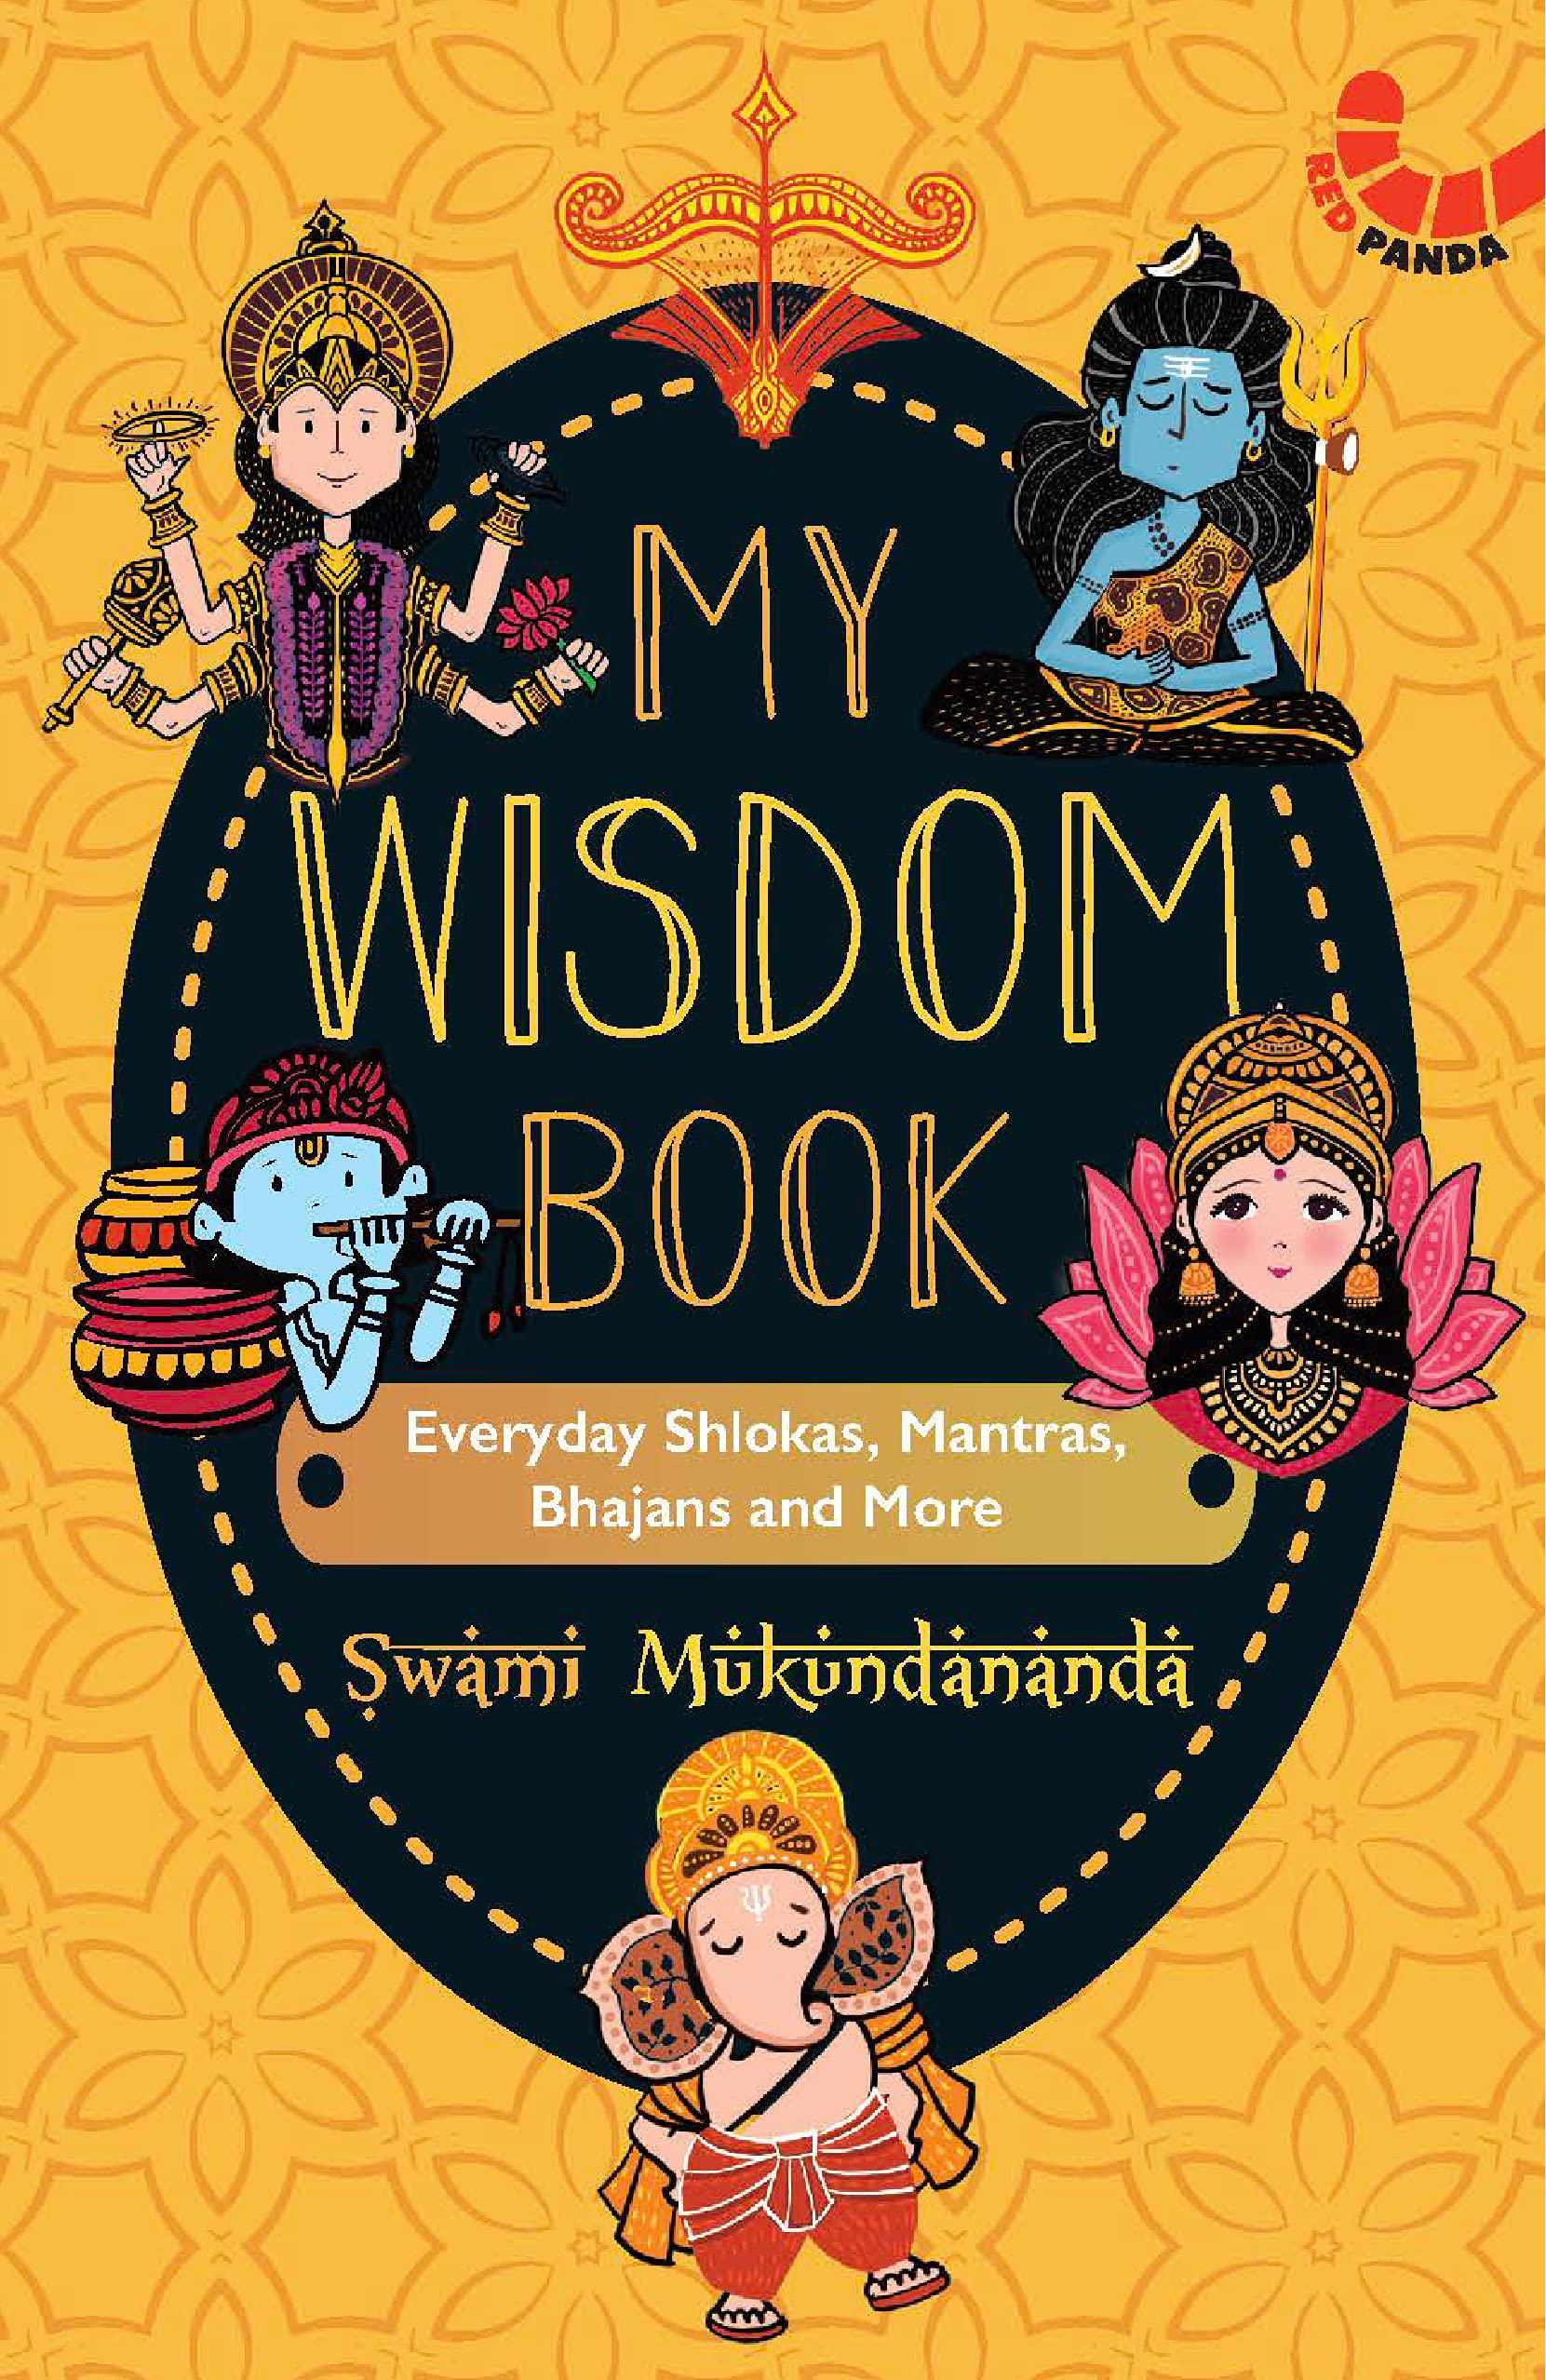 My Wisdom Book: Everyday Shlokas, Mantras, Bhajans and More